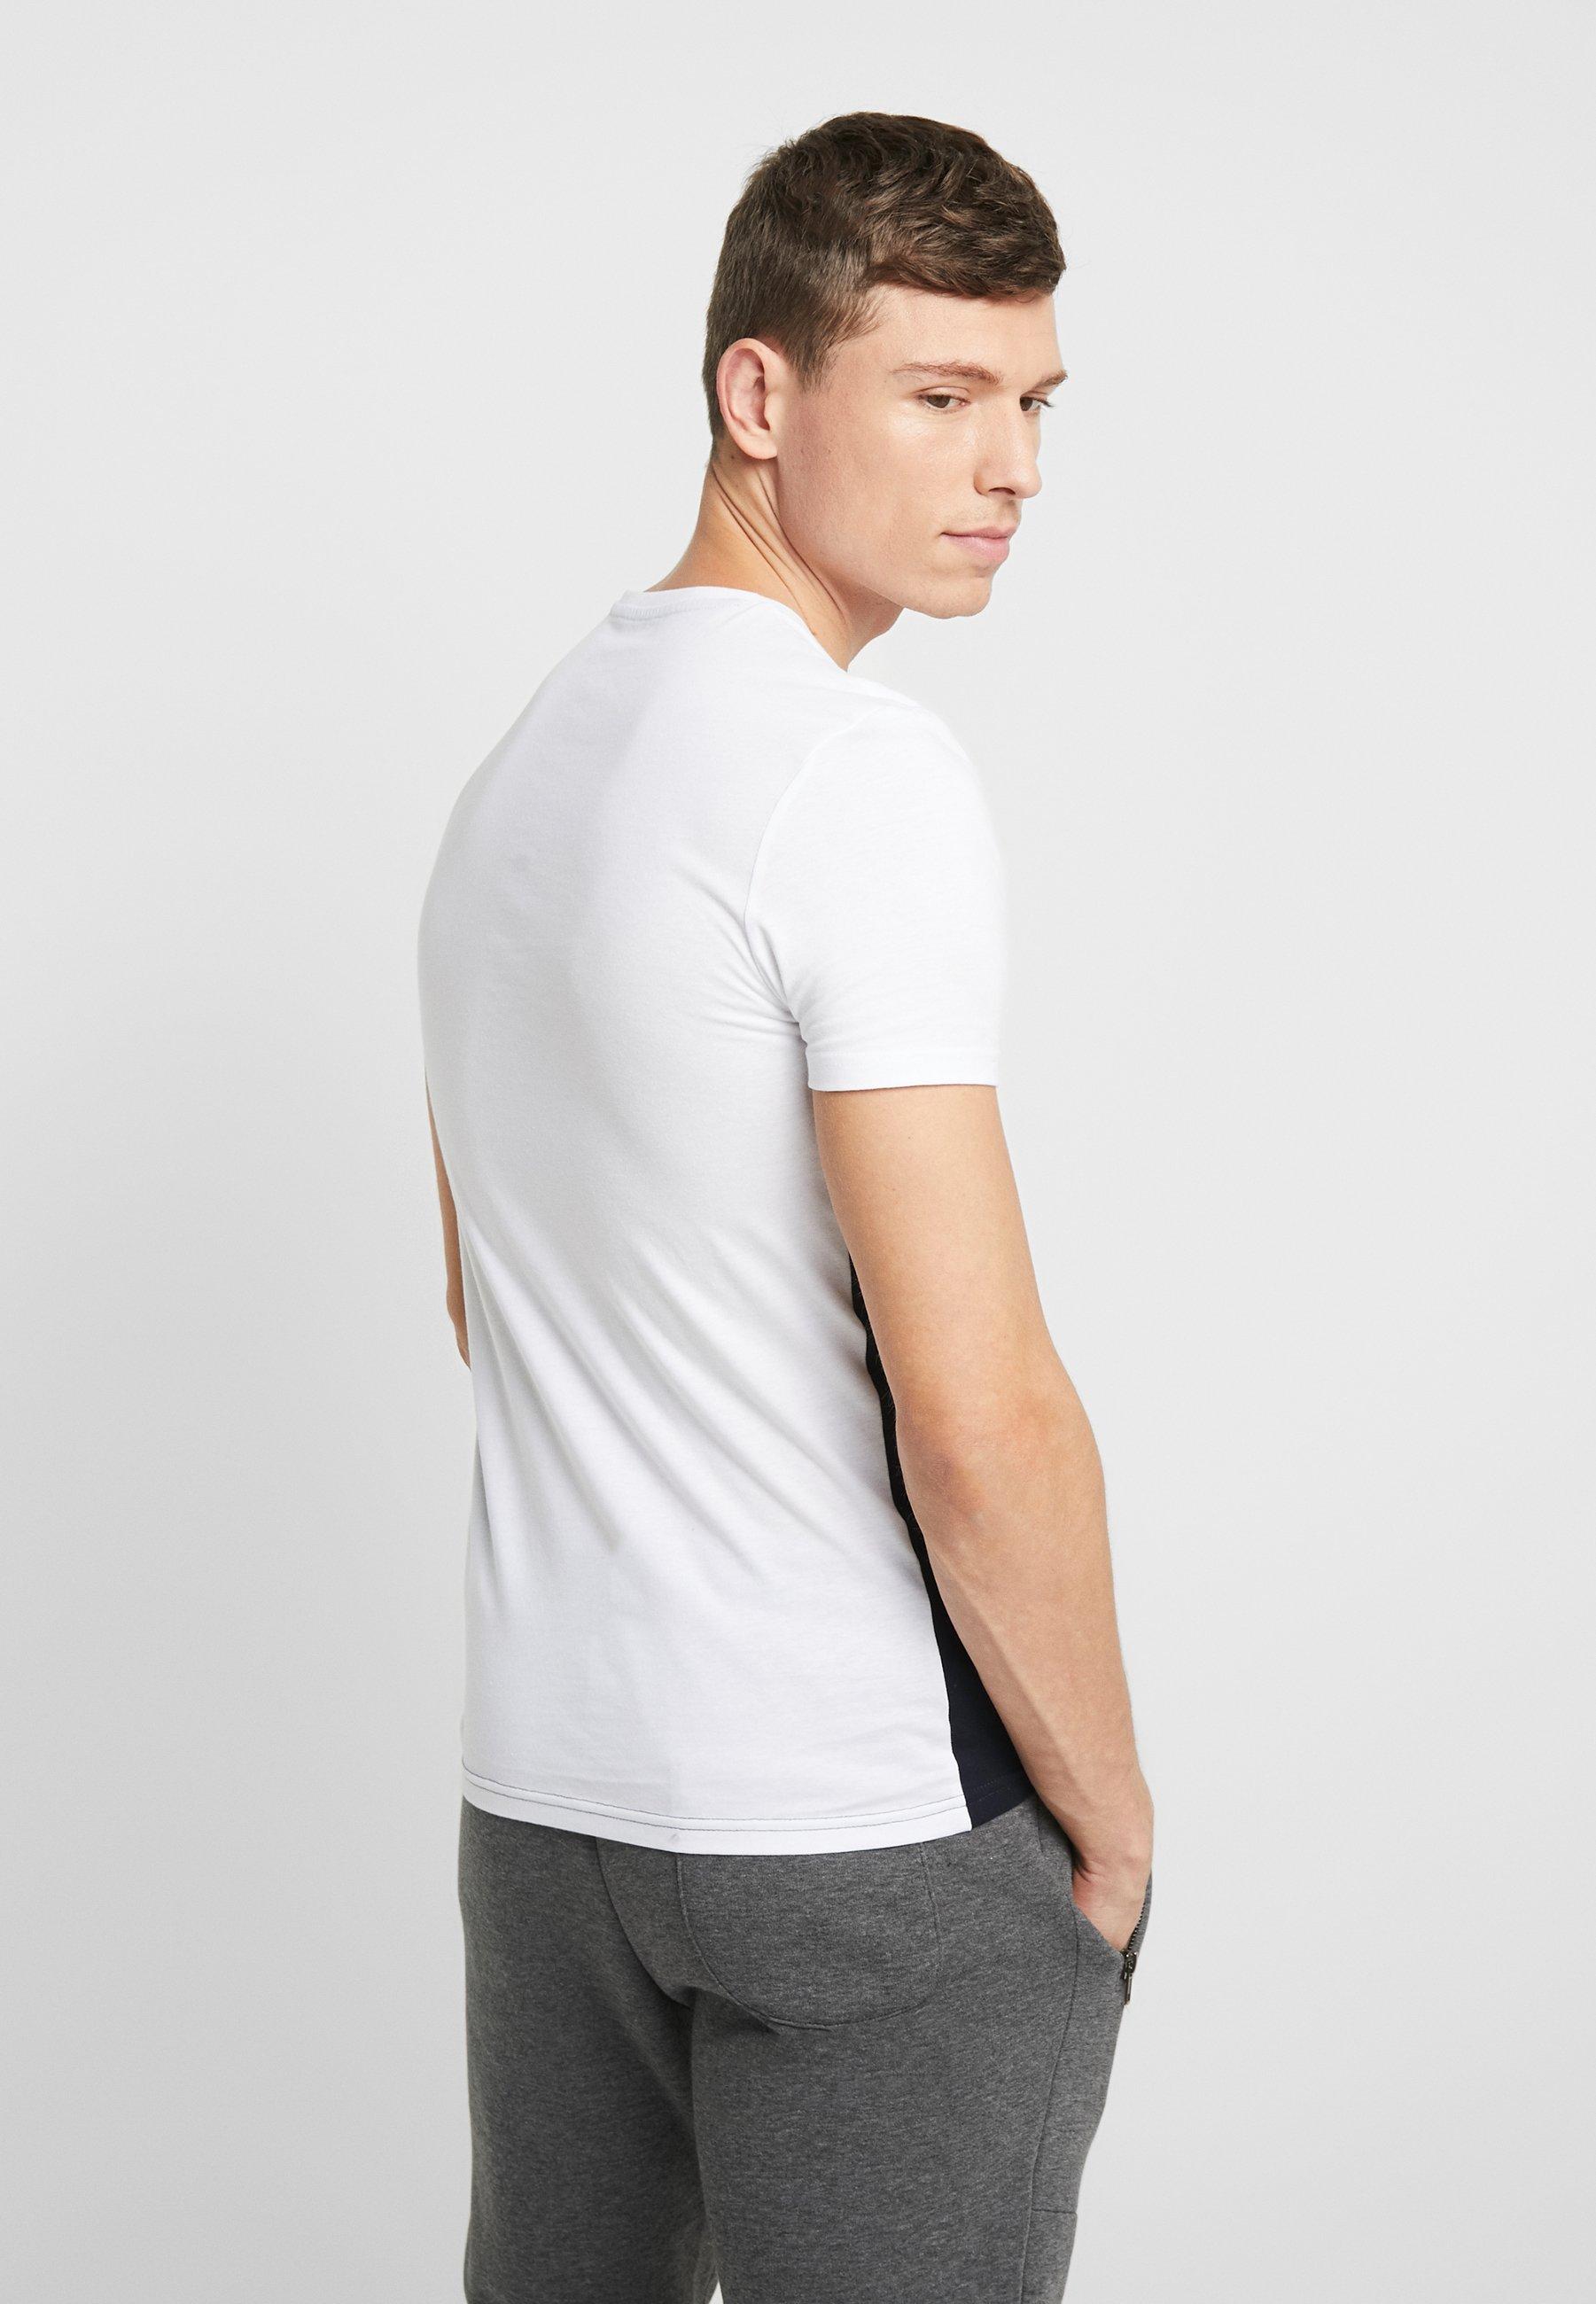 Pier One Basic T-shirt - white/blue